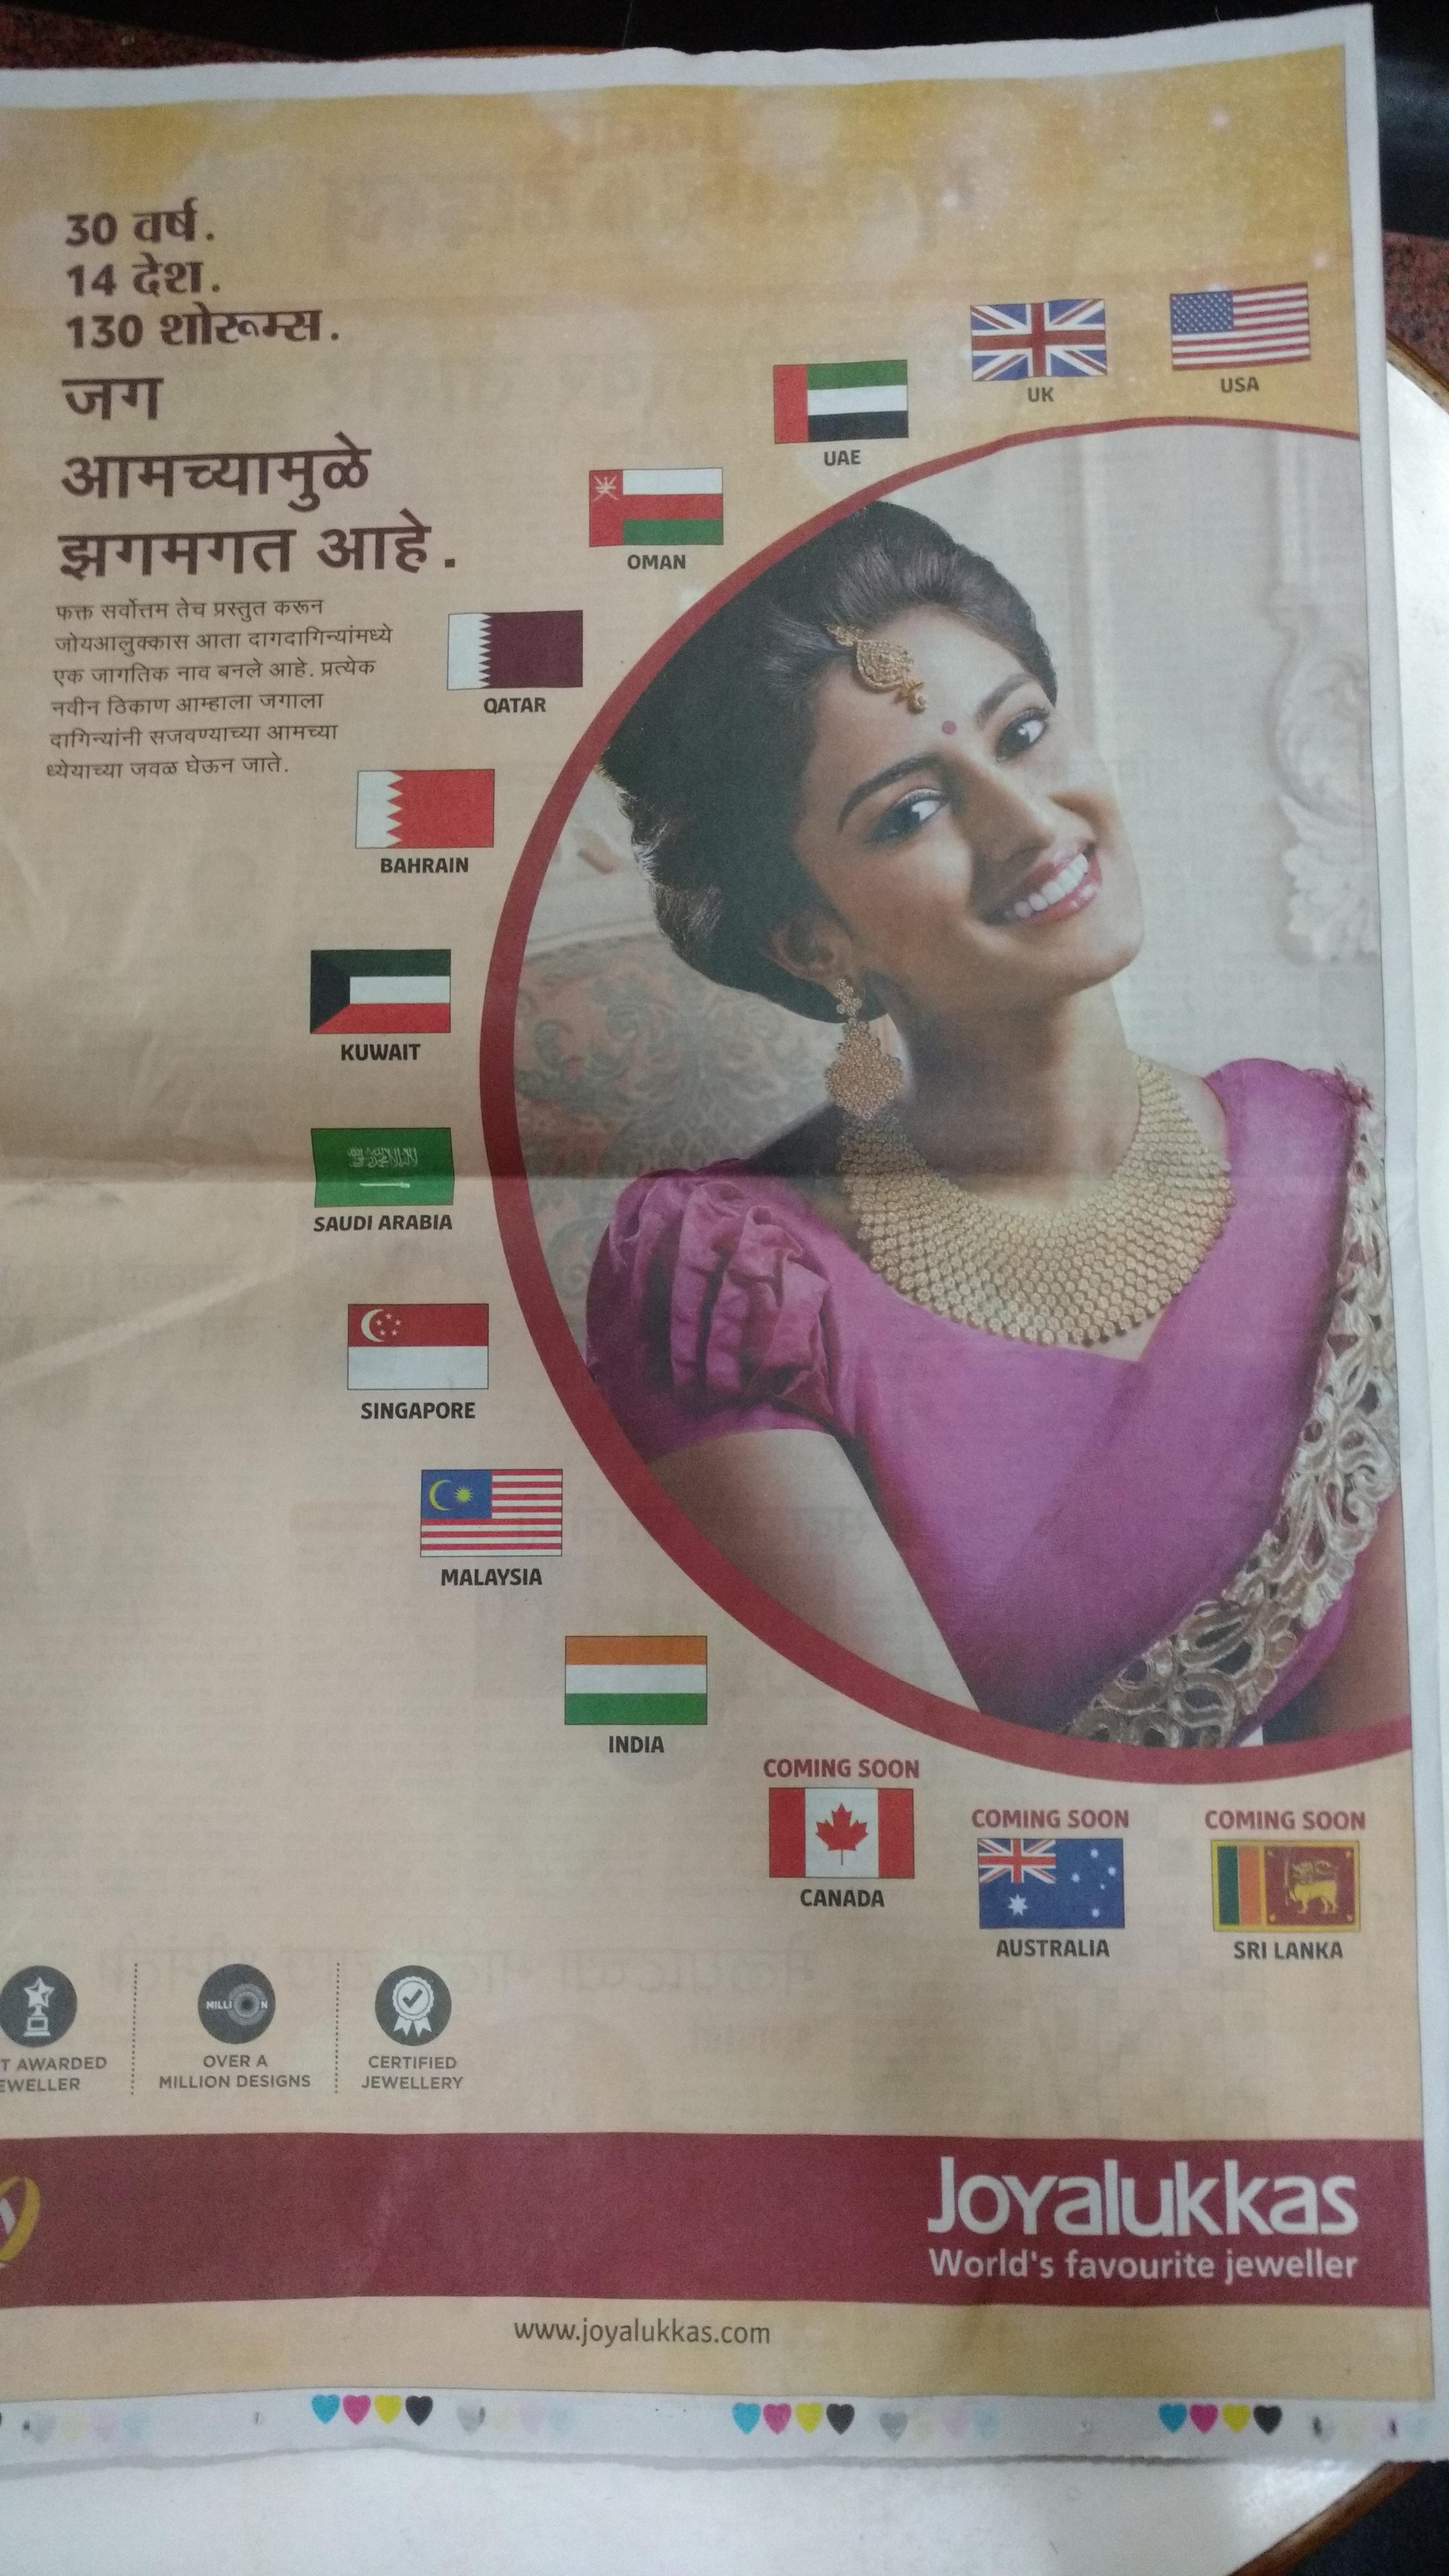 Joyalukkas Advertisement in Maharshtra times